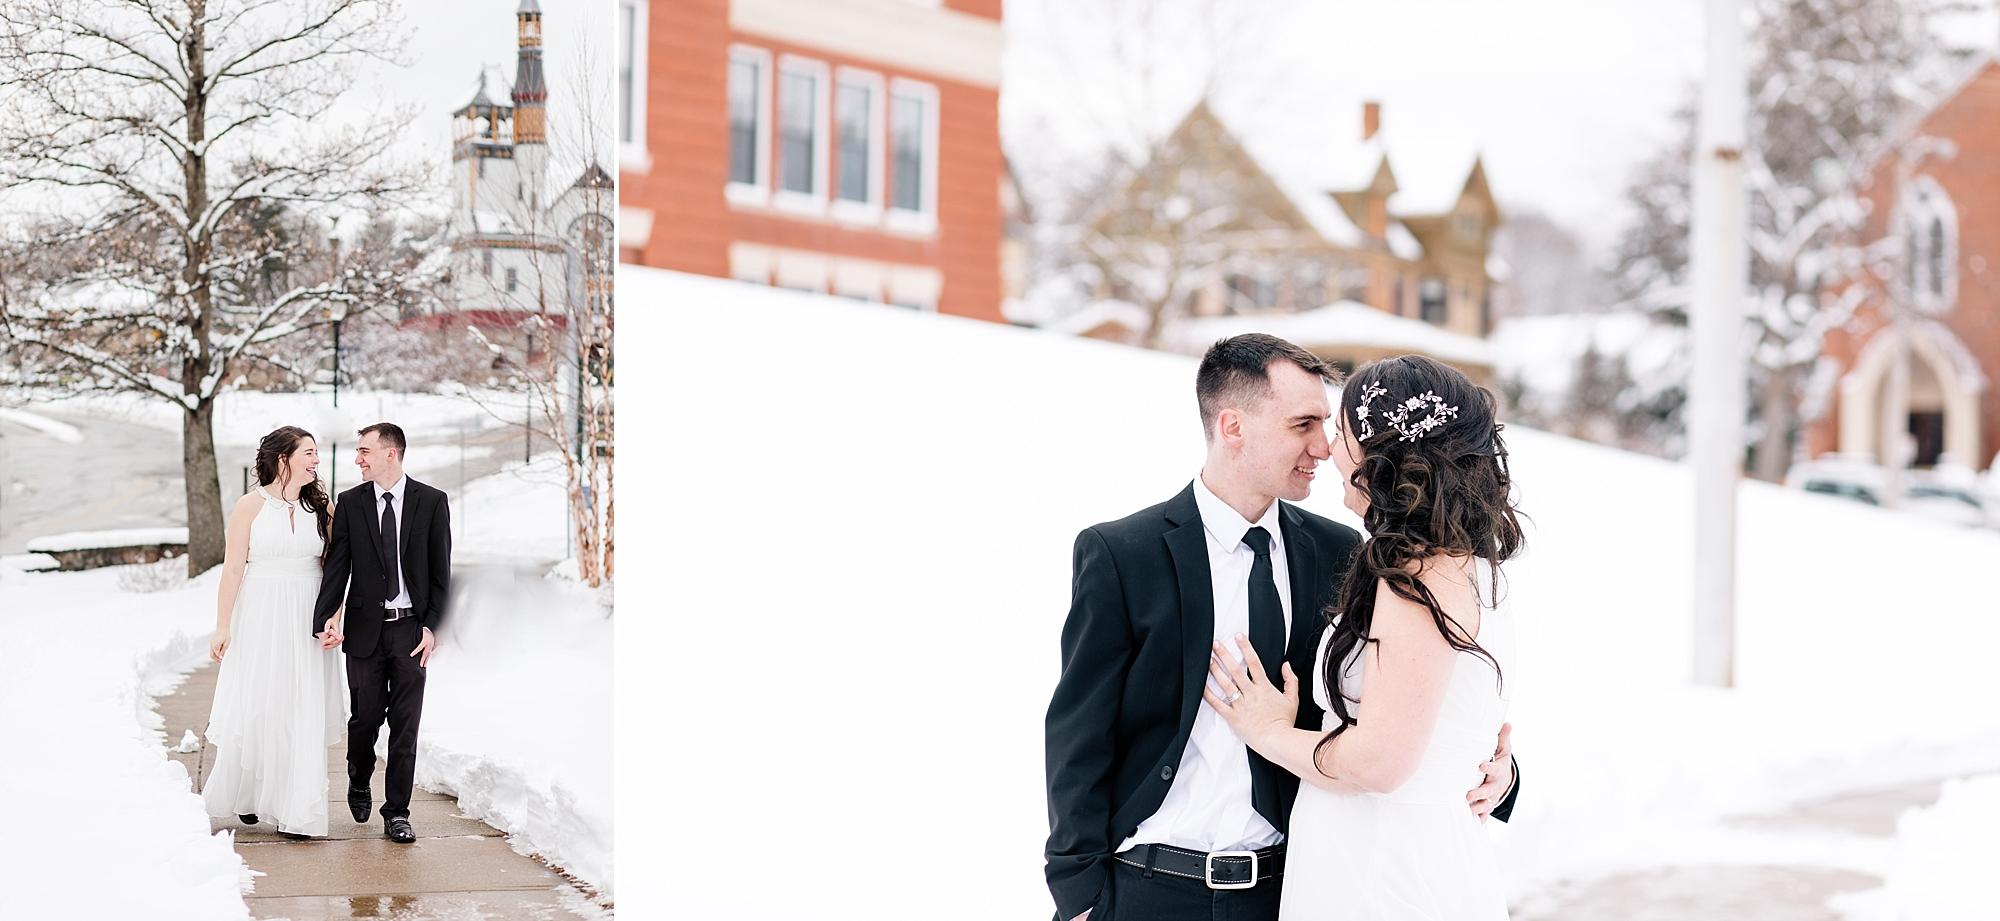 eisleyimages-downtown-marlboro-wedding-newengland_0023.jpg